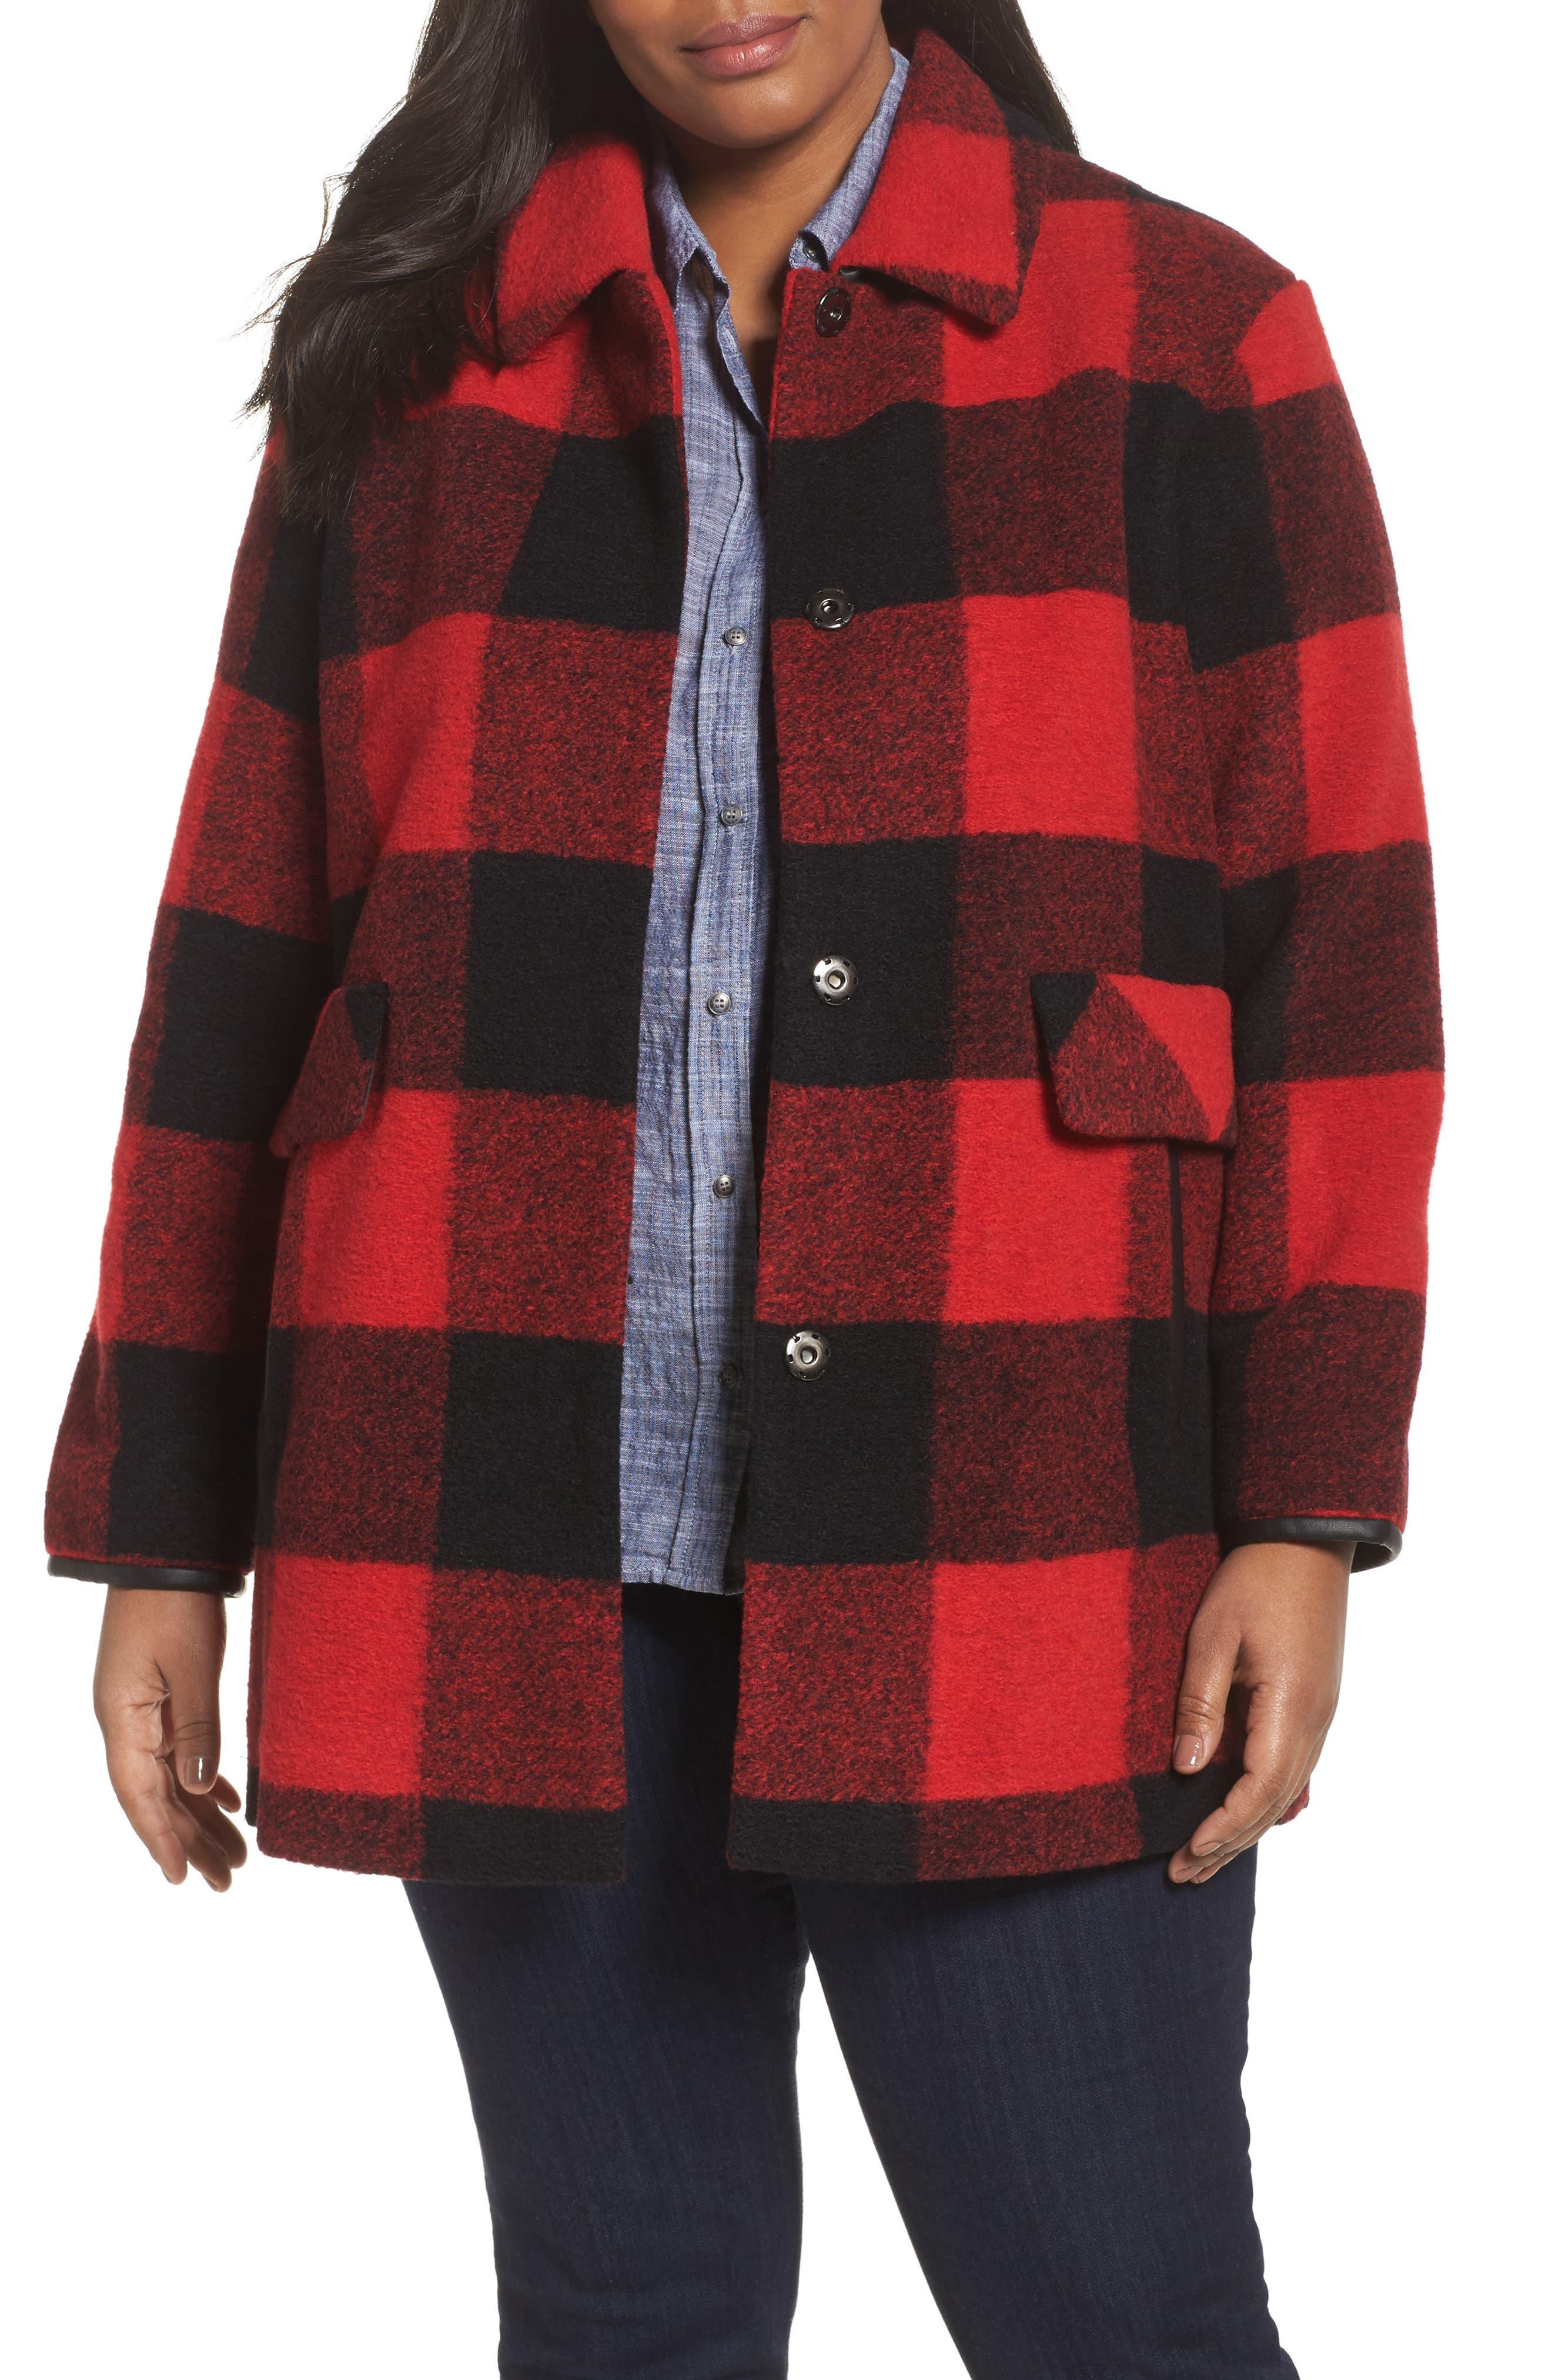 Alternate Image 1 Selected - Pendleton Paul Bunyan Plaid Wool Blend Barn Coat (Plus Size)